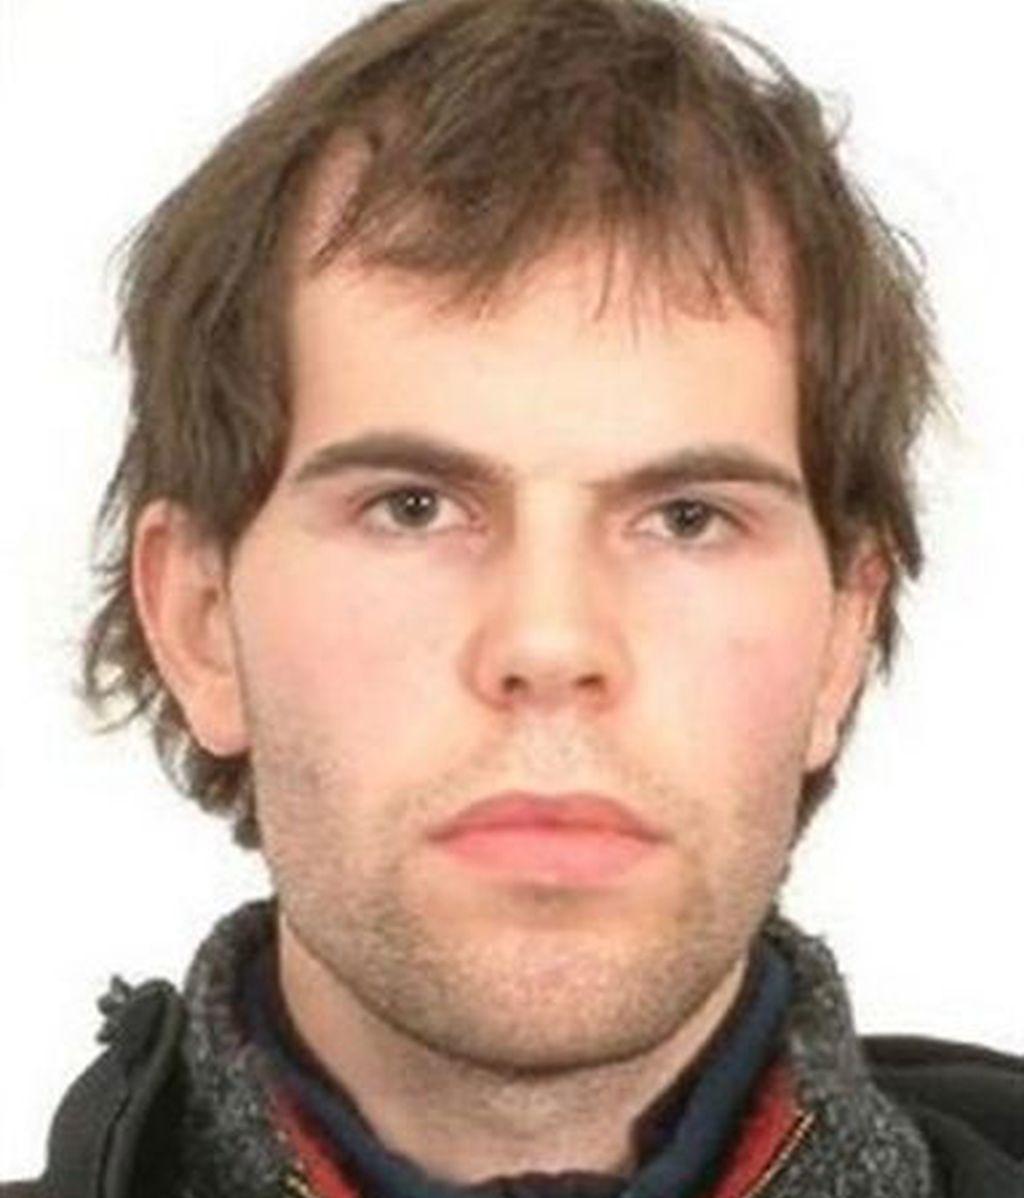 Oier Ibarguiren Sarasola, miembro de ETA detenido